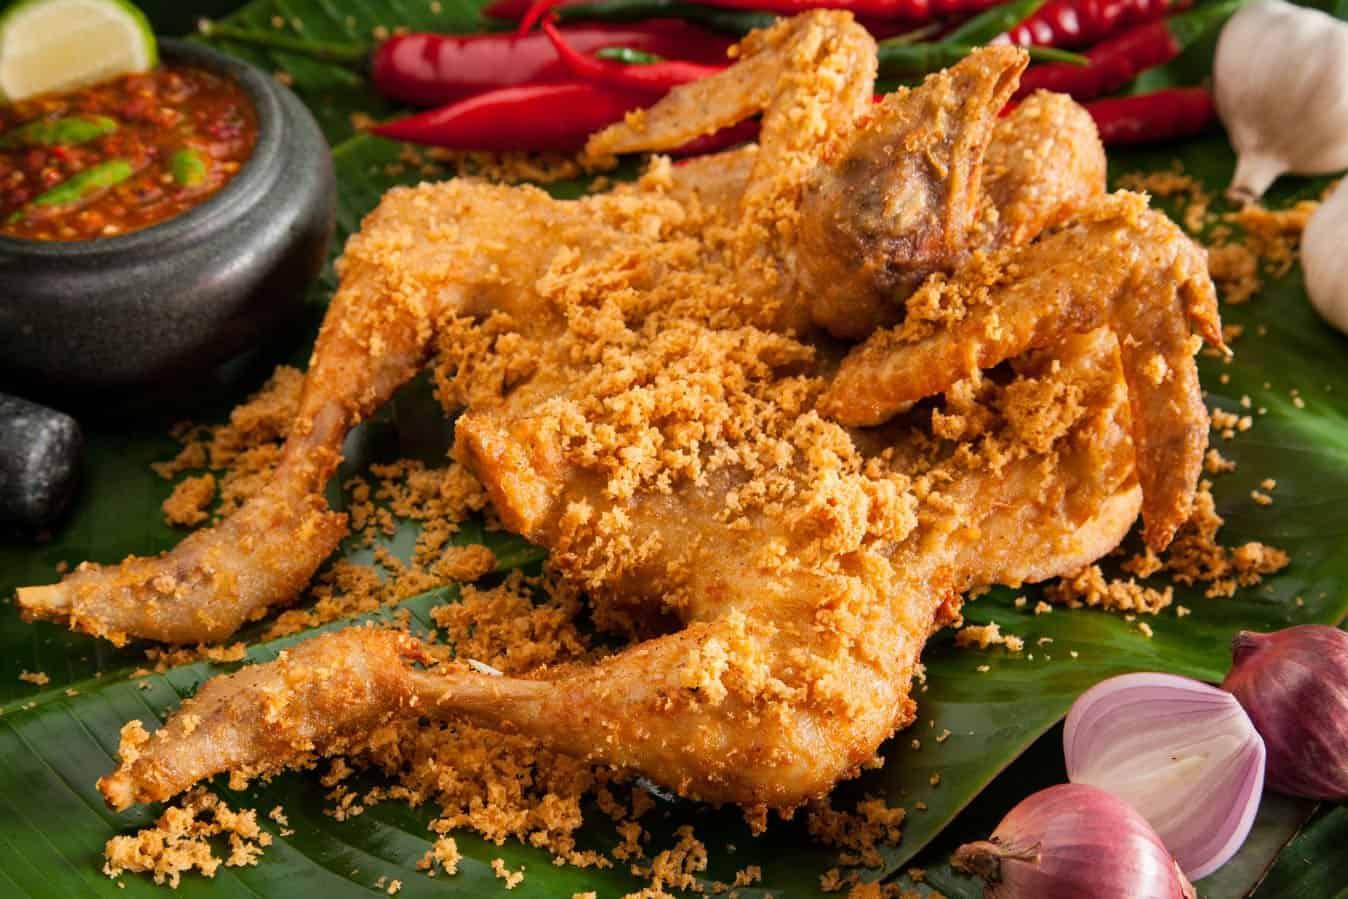 7 Ayam Goreng Legendaris Di Jogja, Enaknya Bikin Ketagihan